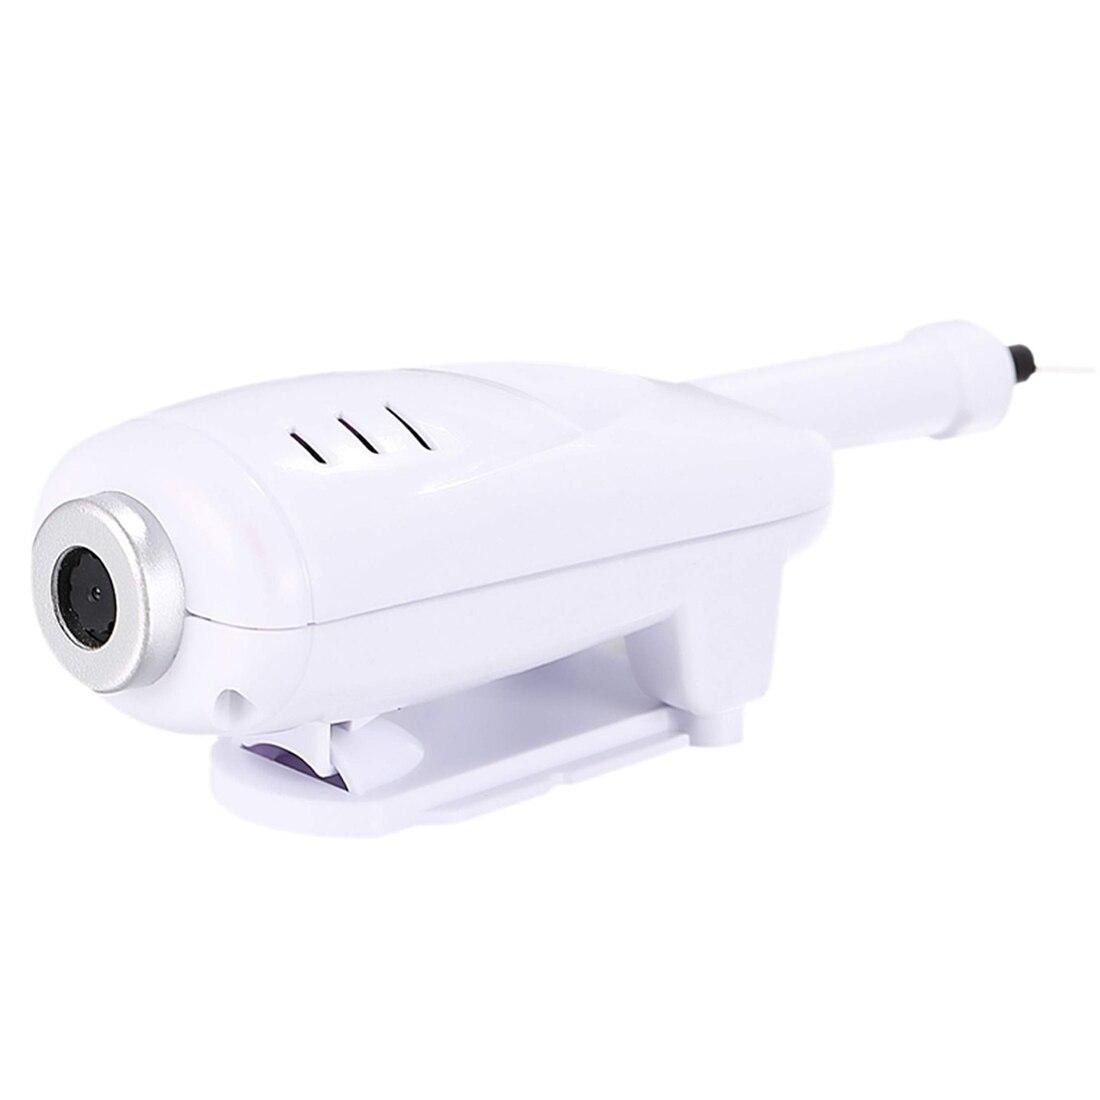 FBIL Syma X5SW X5SC RC Quadcopter Spare Camera FPV WiFi 0 3MP Camera White